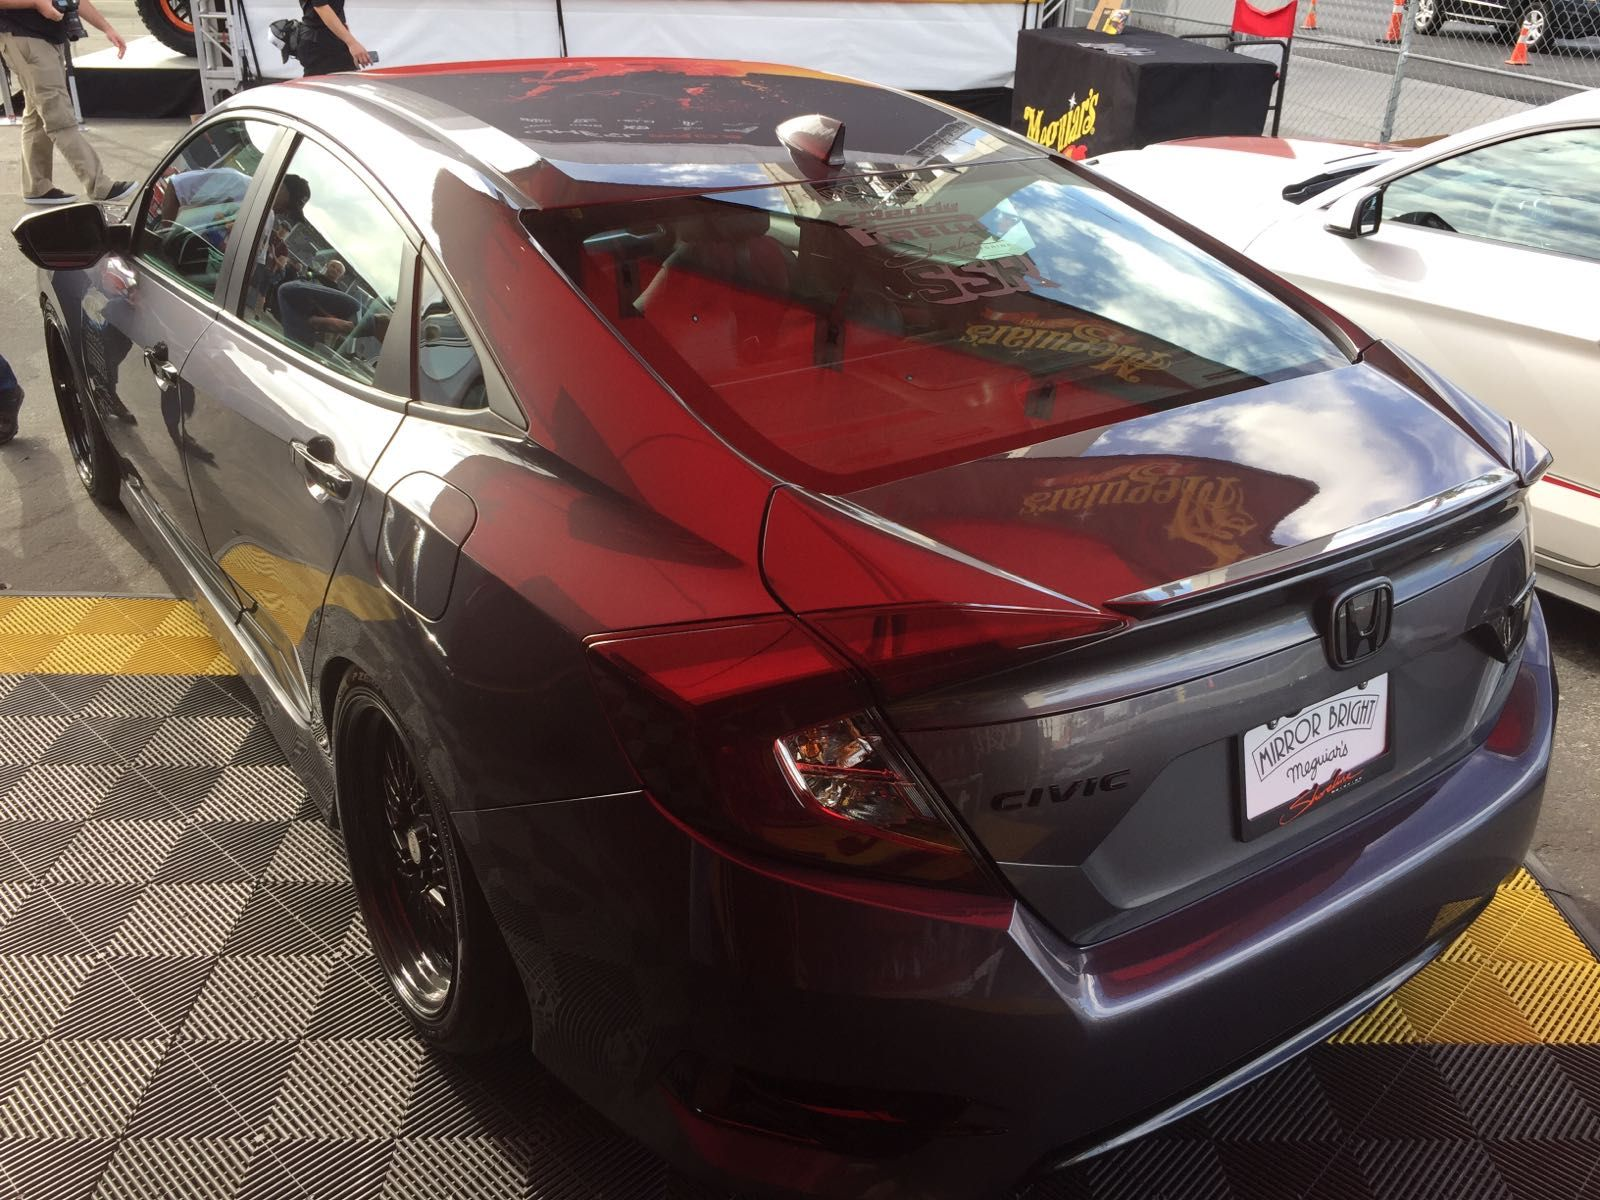 US Honda Civic Sedan at The SEMA Show 2016 (met afbeeldingen)